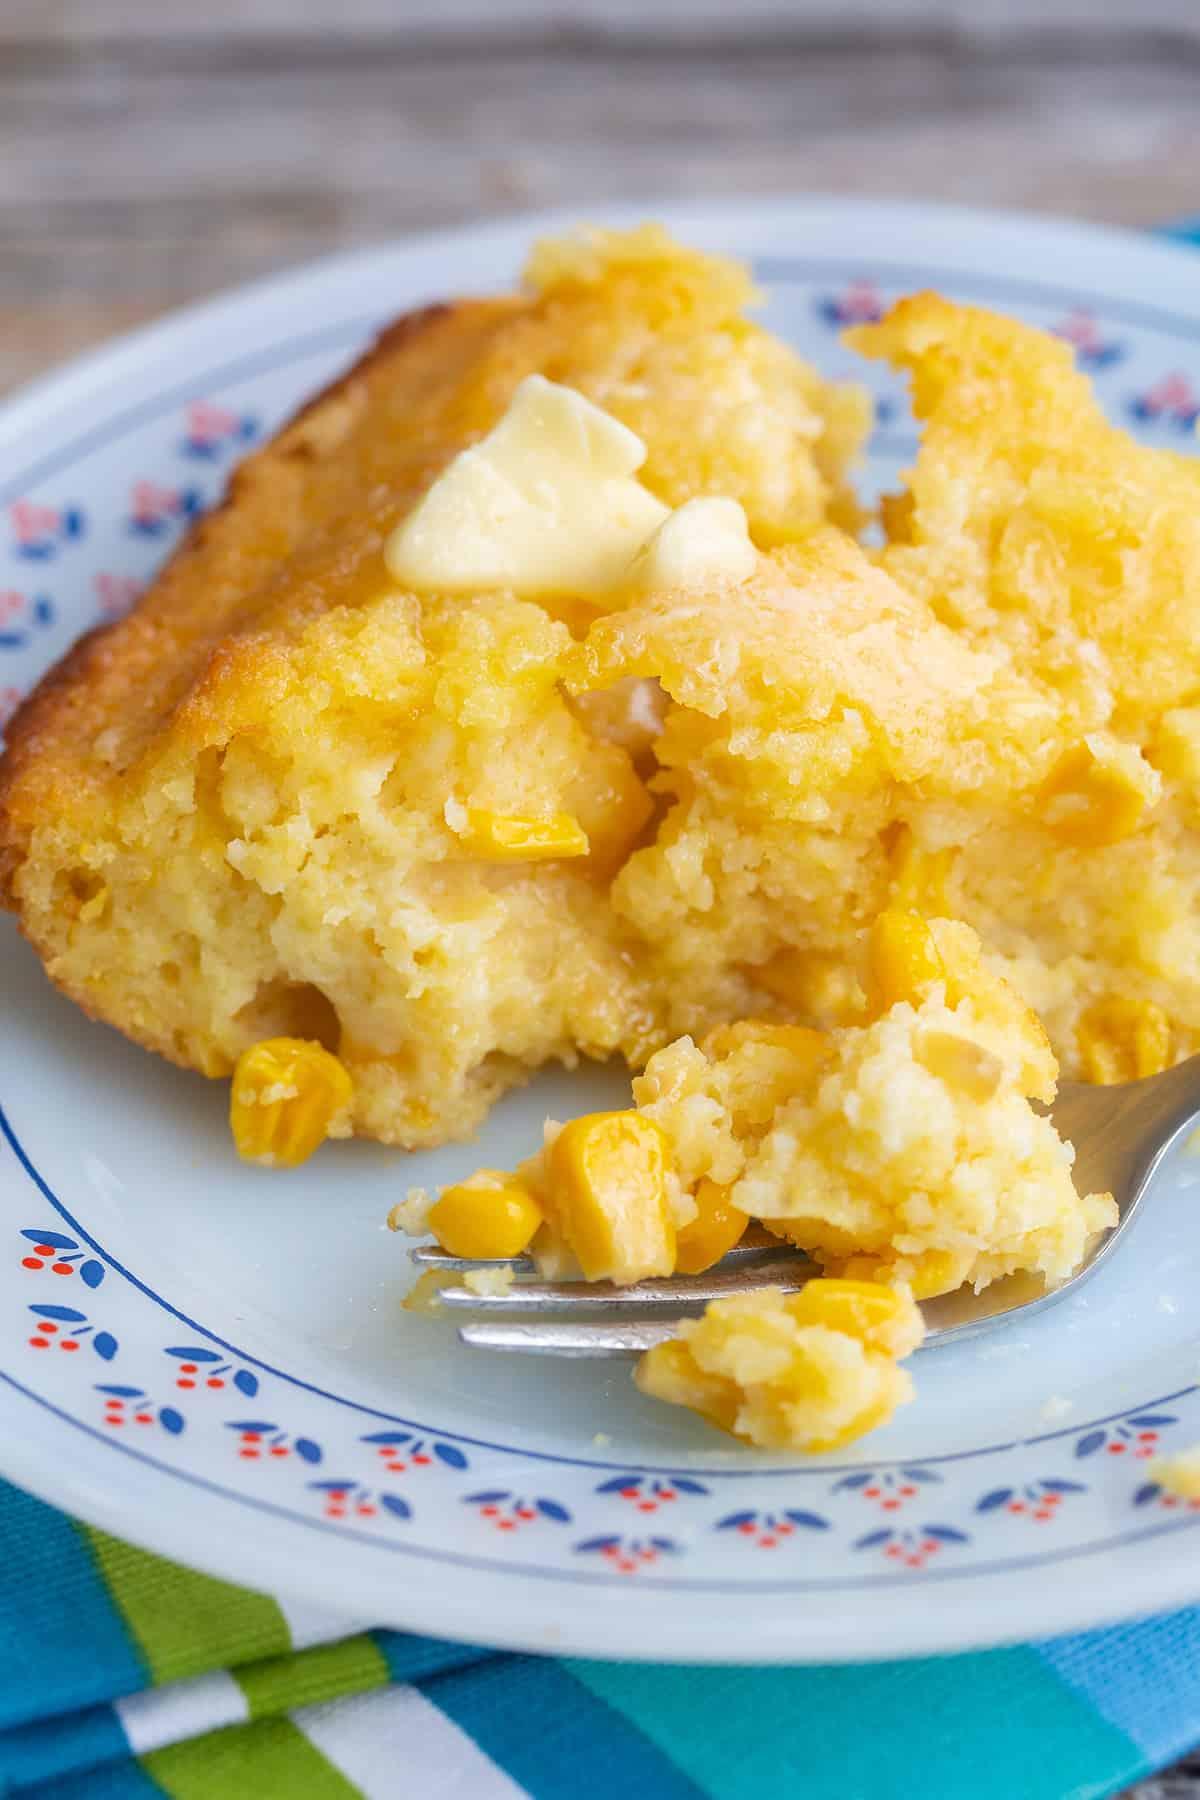 Jiffy Corn Casserole in a plate